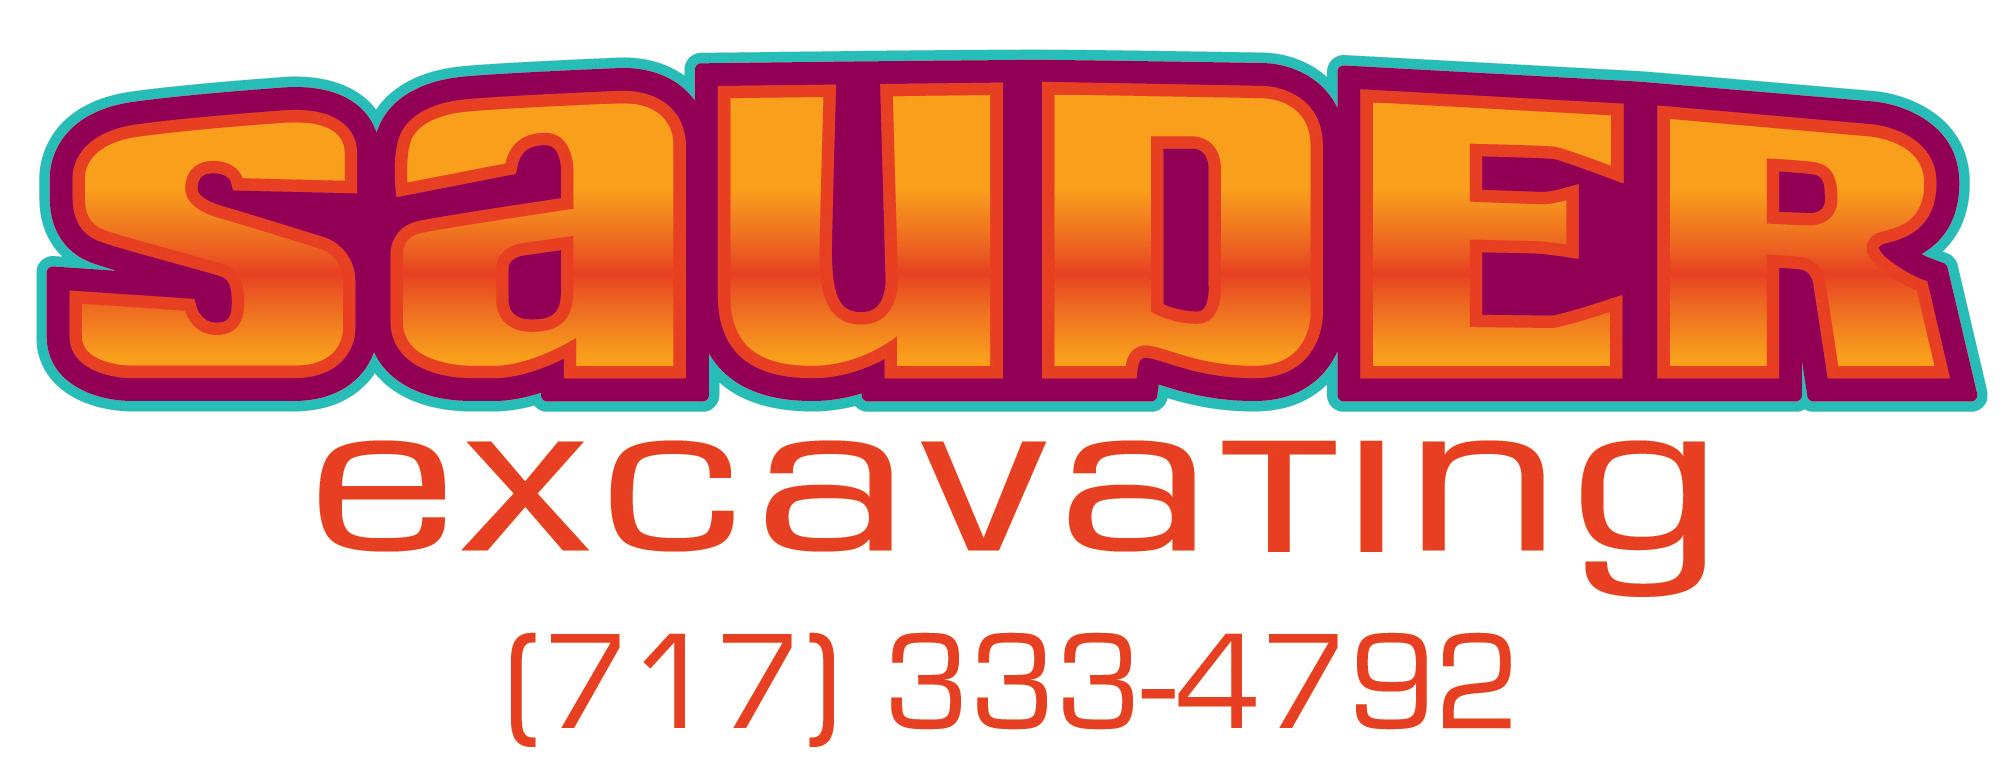 Sauder Excavating image 1